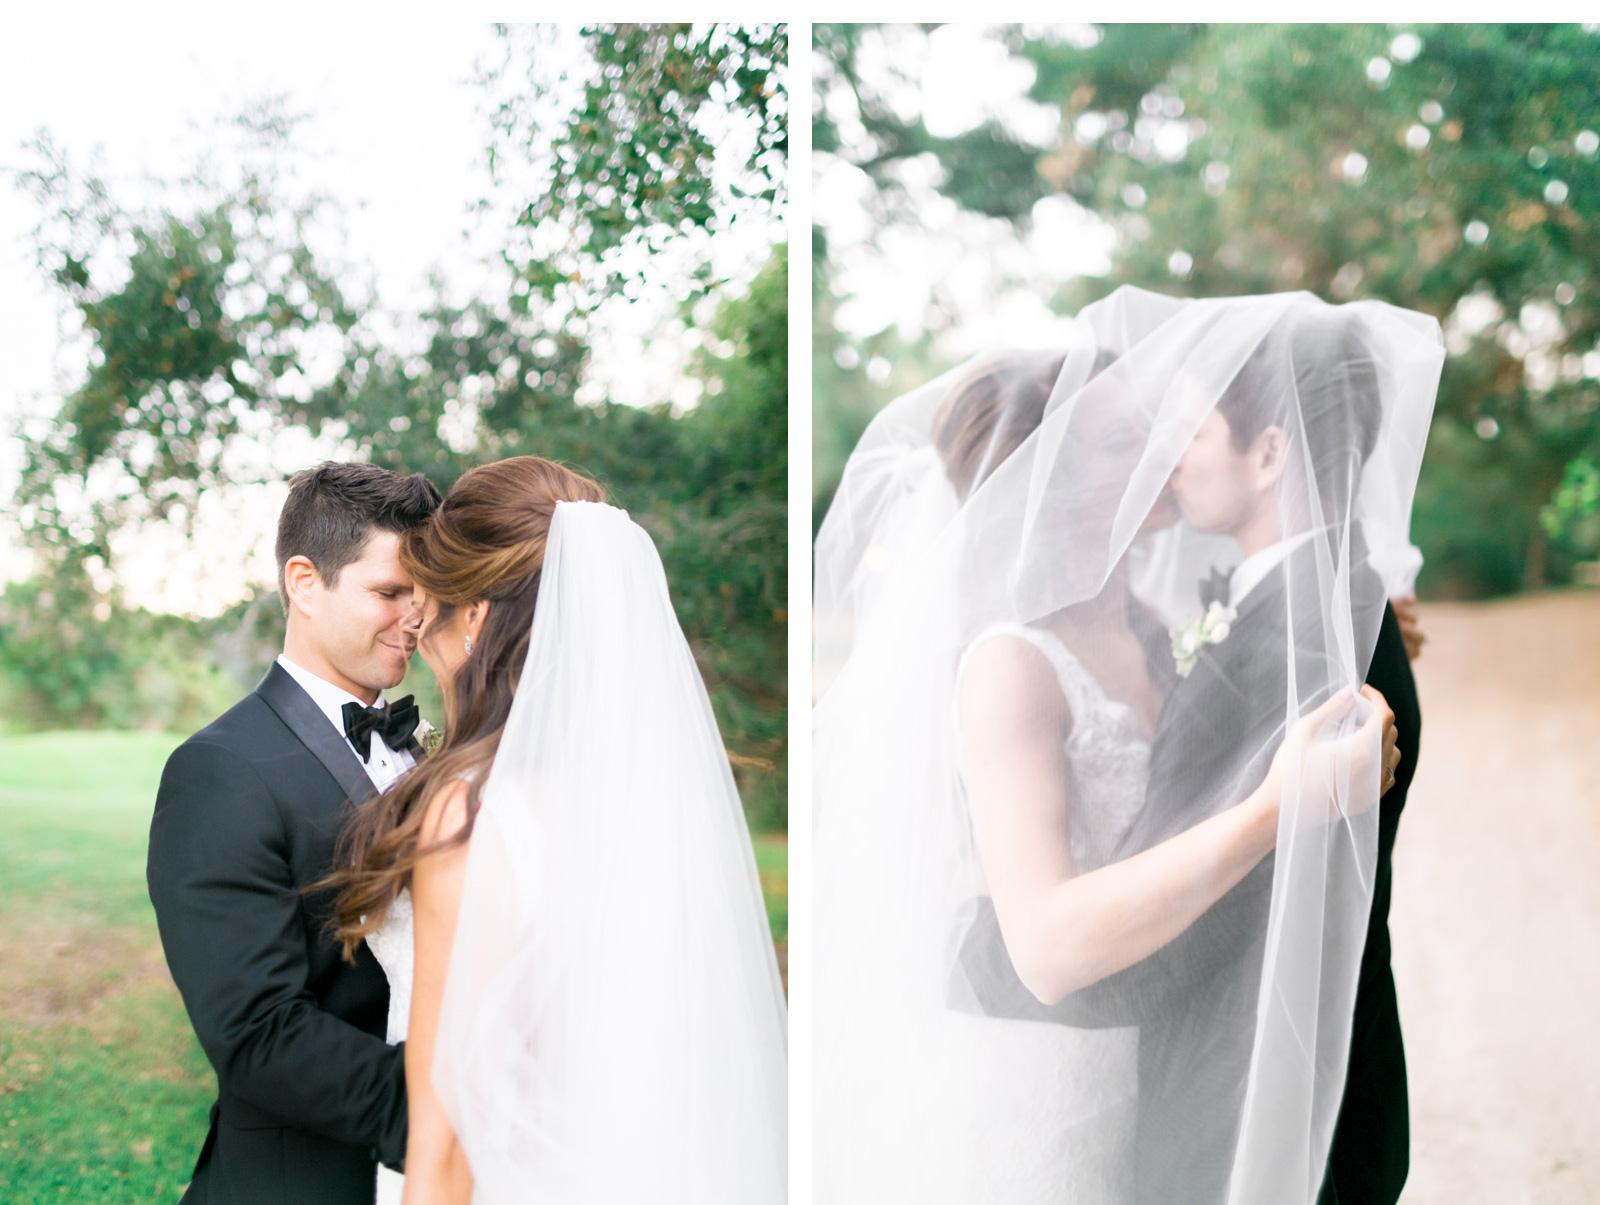 Daniel-and-Nia-Booko-Wedding_08.jpg